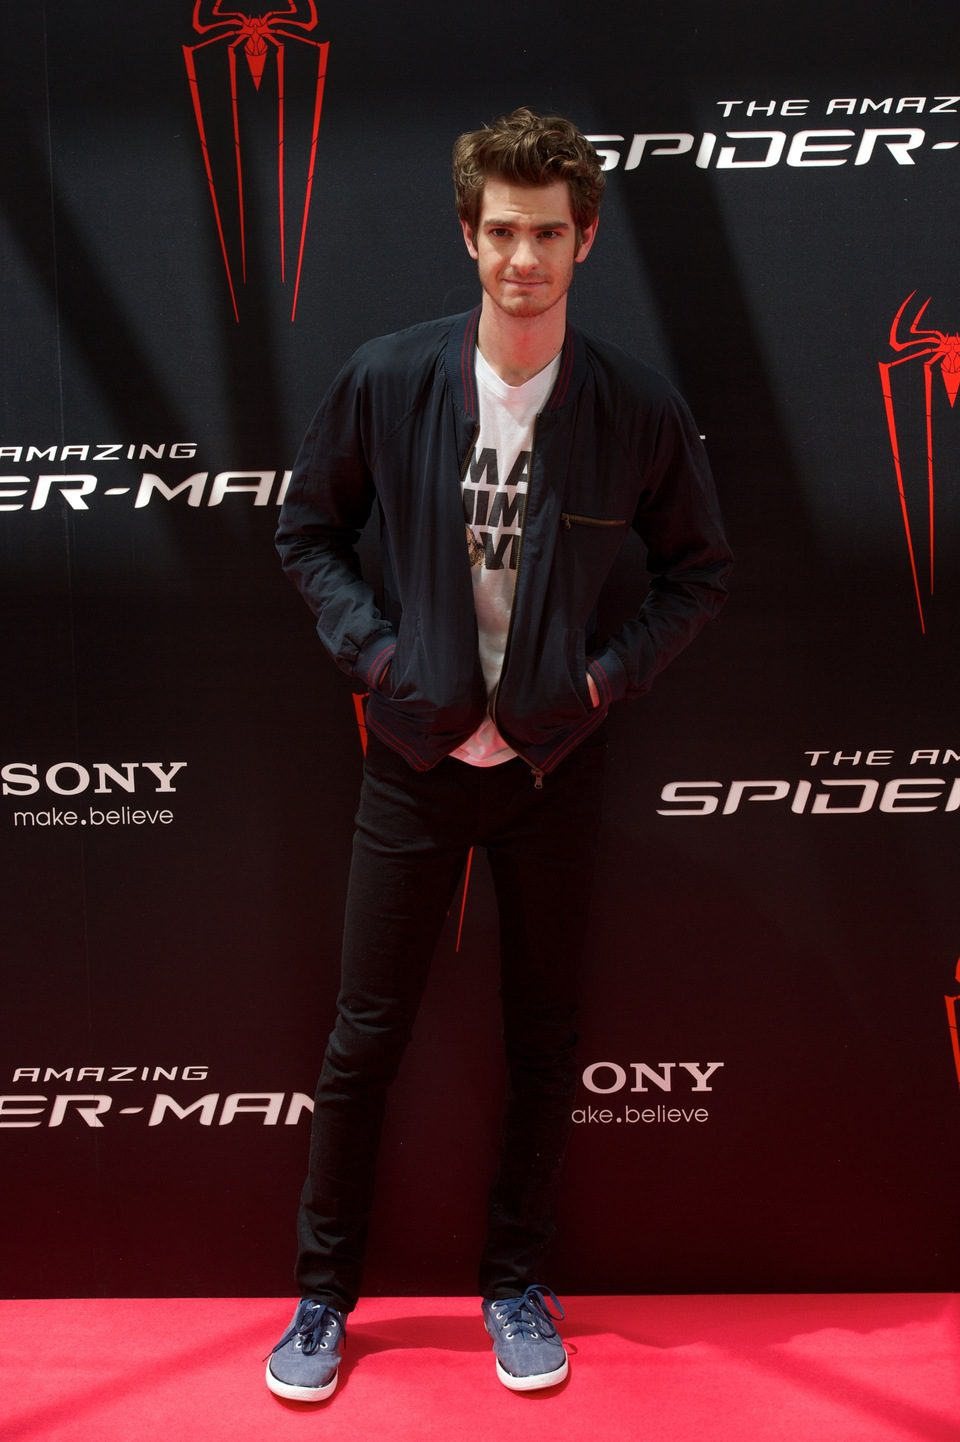 Andrew Garfield presenta 'The Amazing Spider-Man' en Madrid